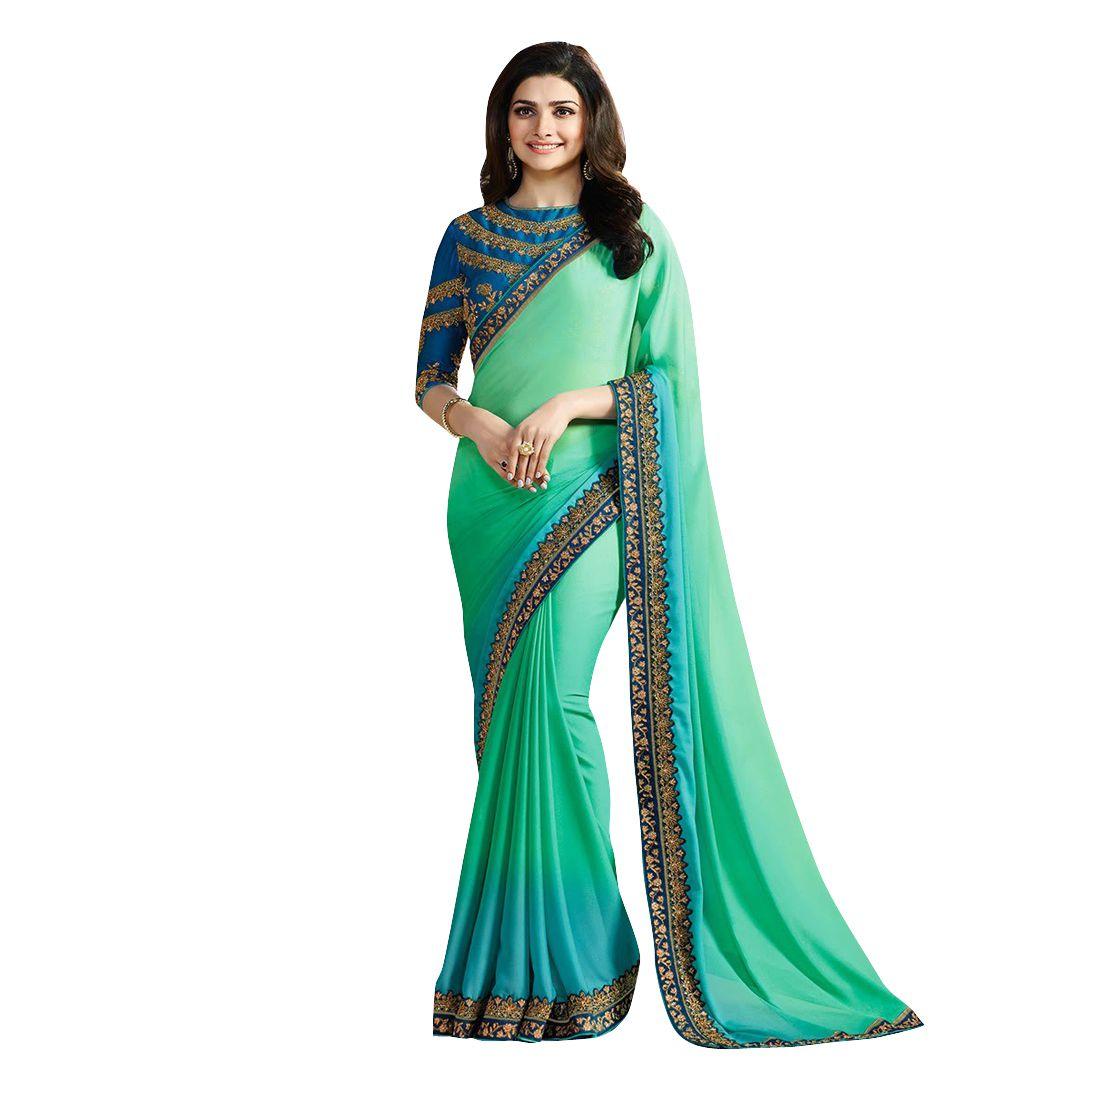 Laxmipati fashion Green and Blue Georgette Saree